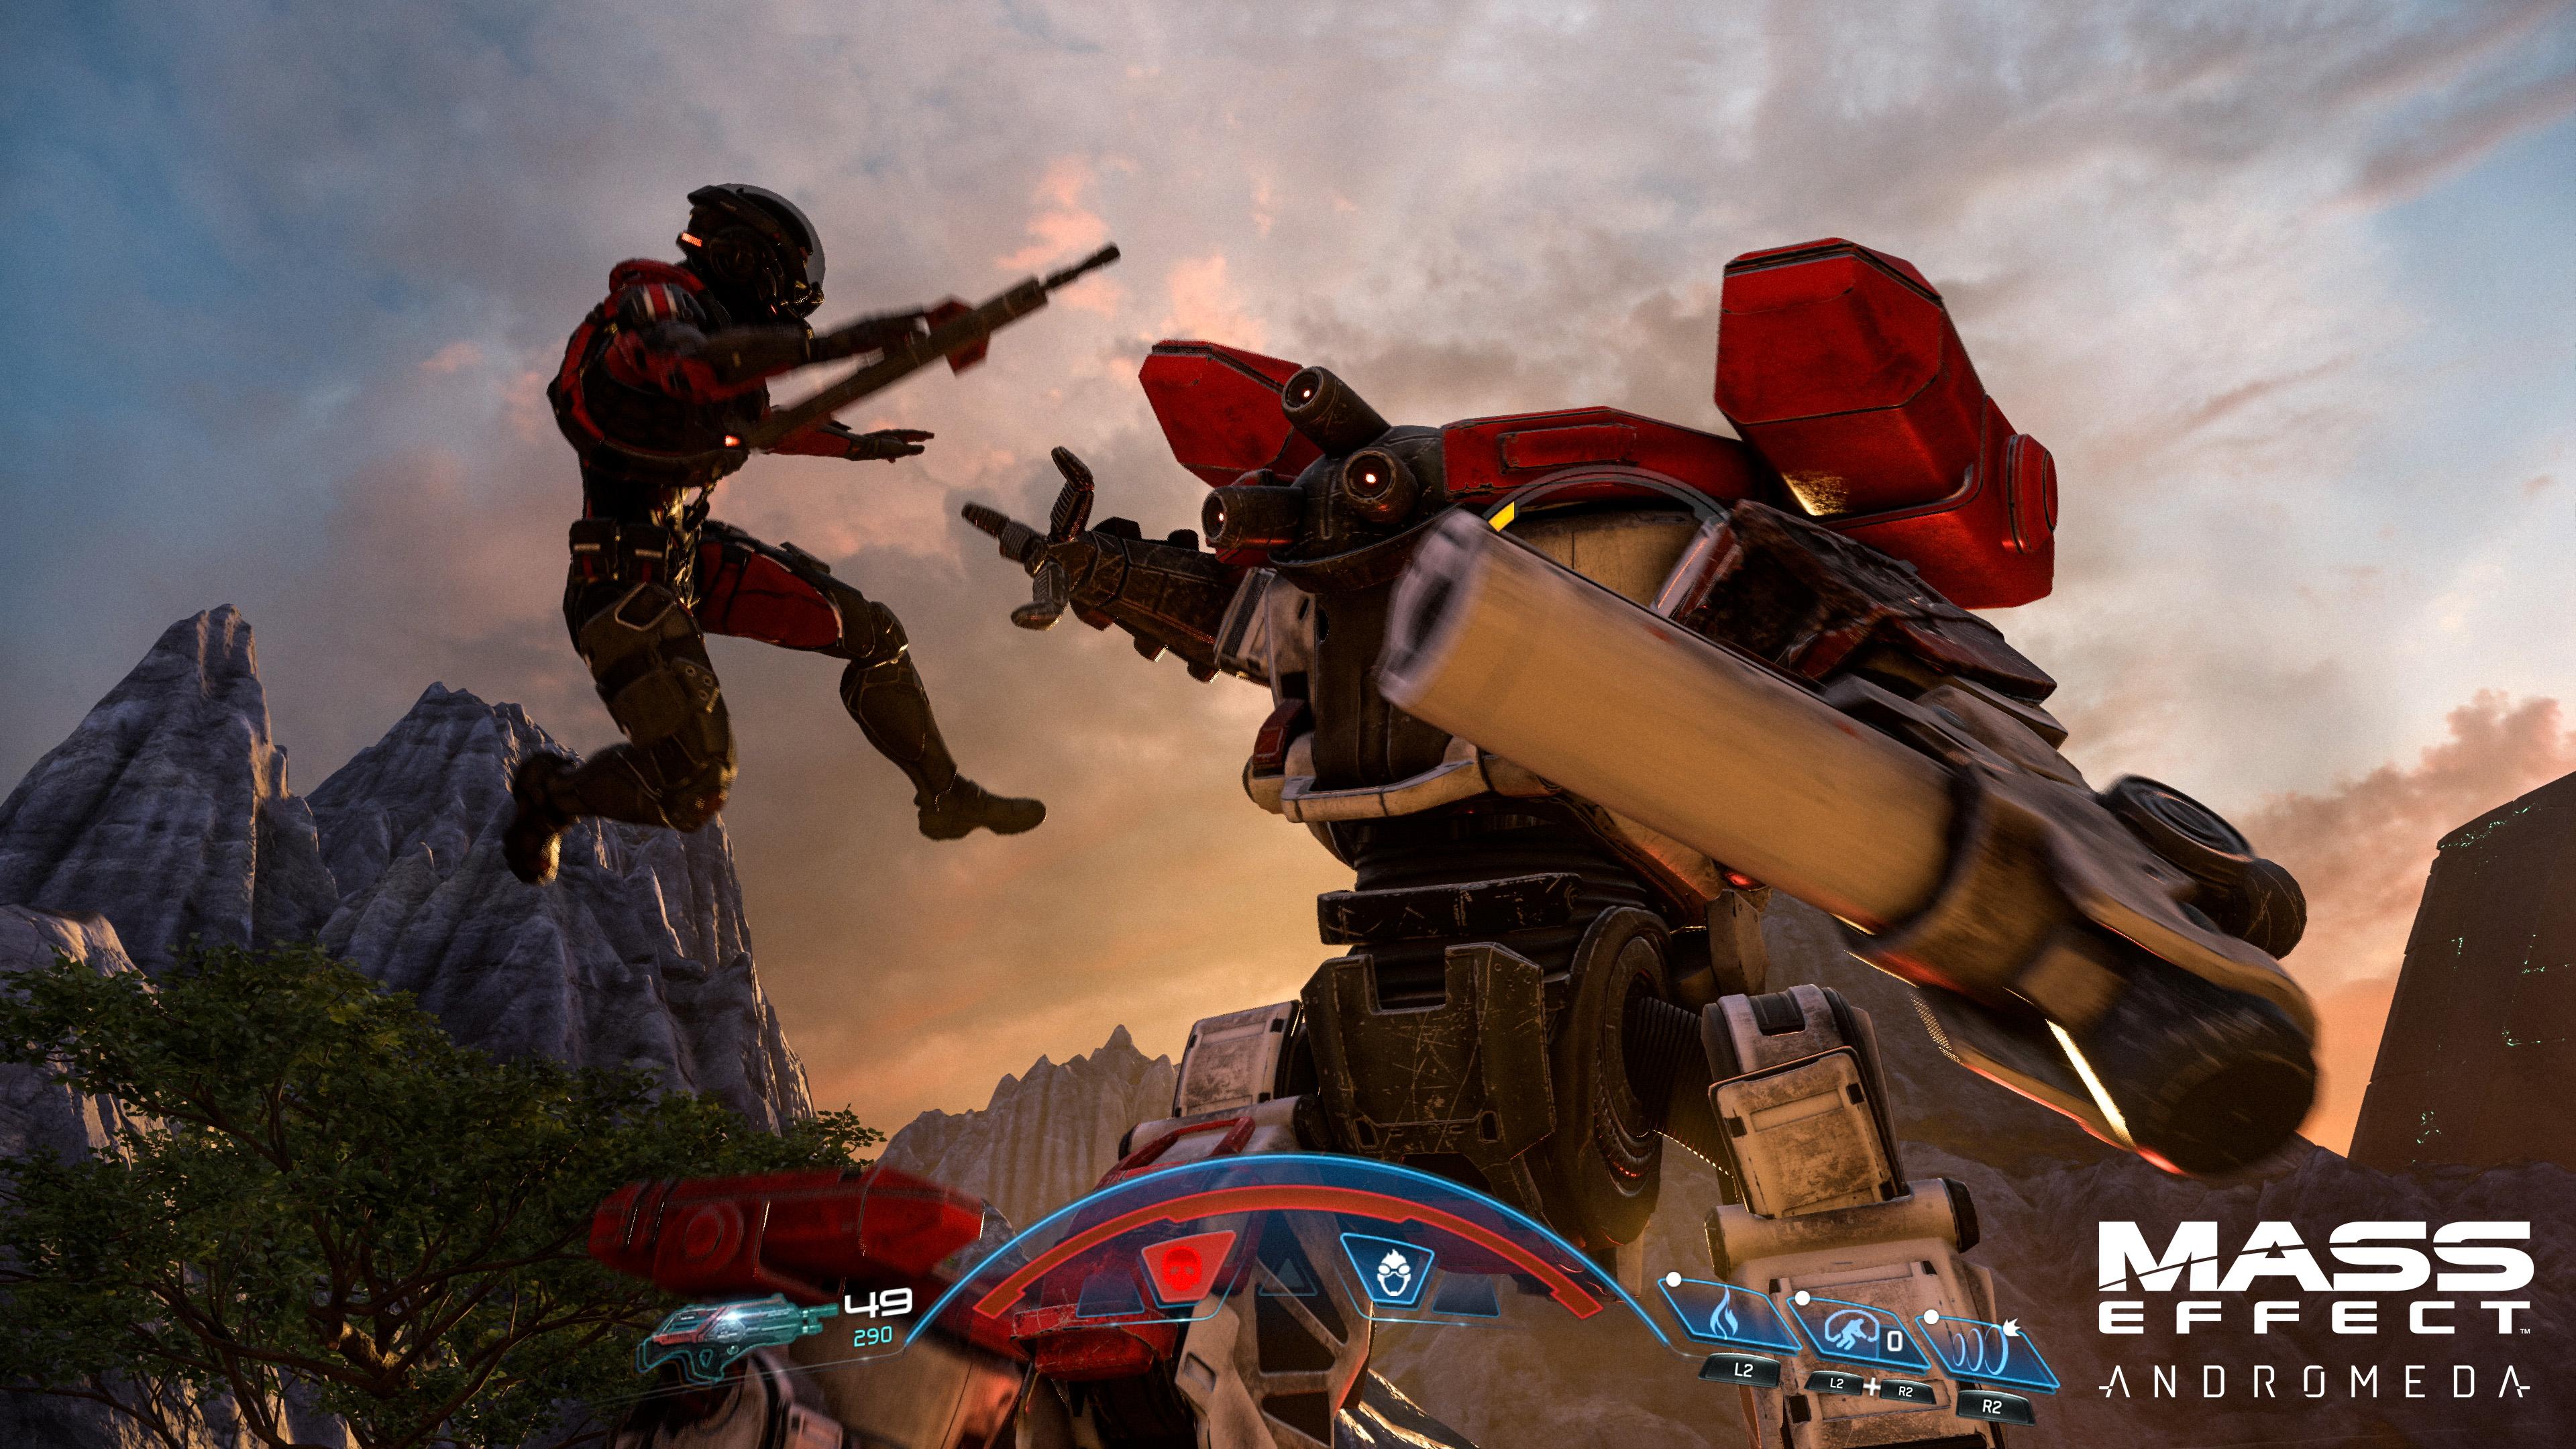 Mass Effect: Andromeda Gameplay Reveal